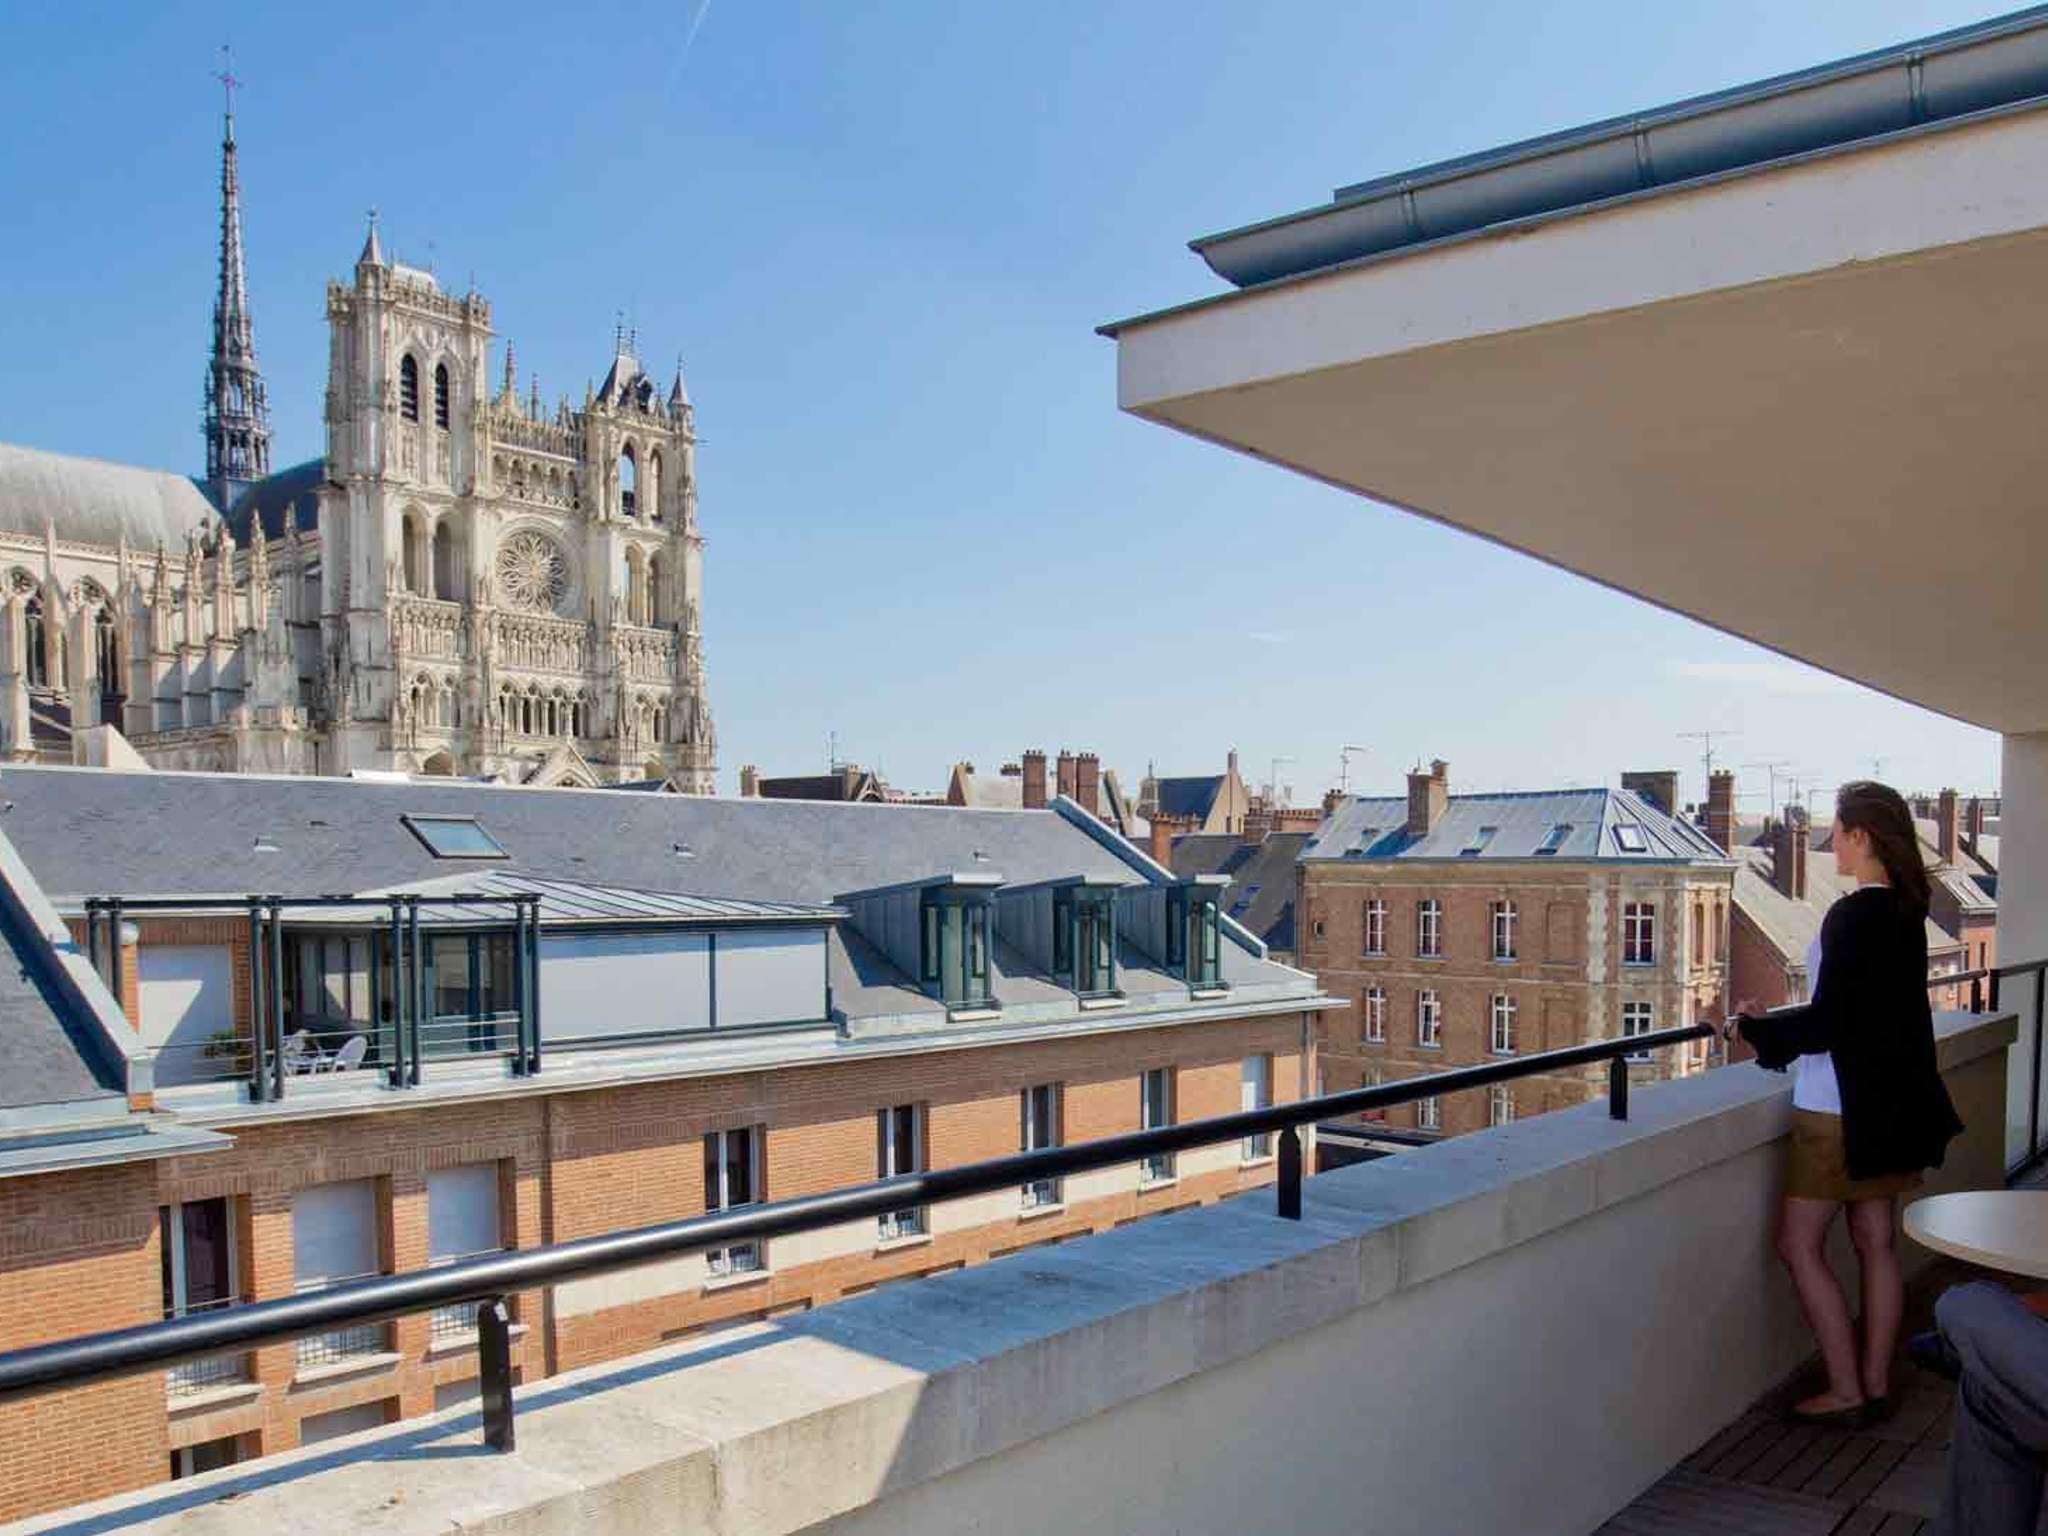 Hotell – Hôtel Mercure Amiens Cathédrale